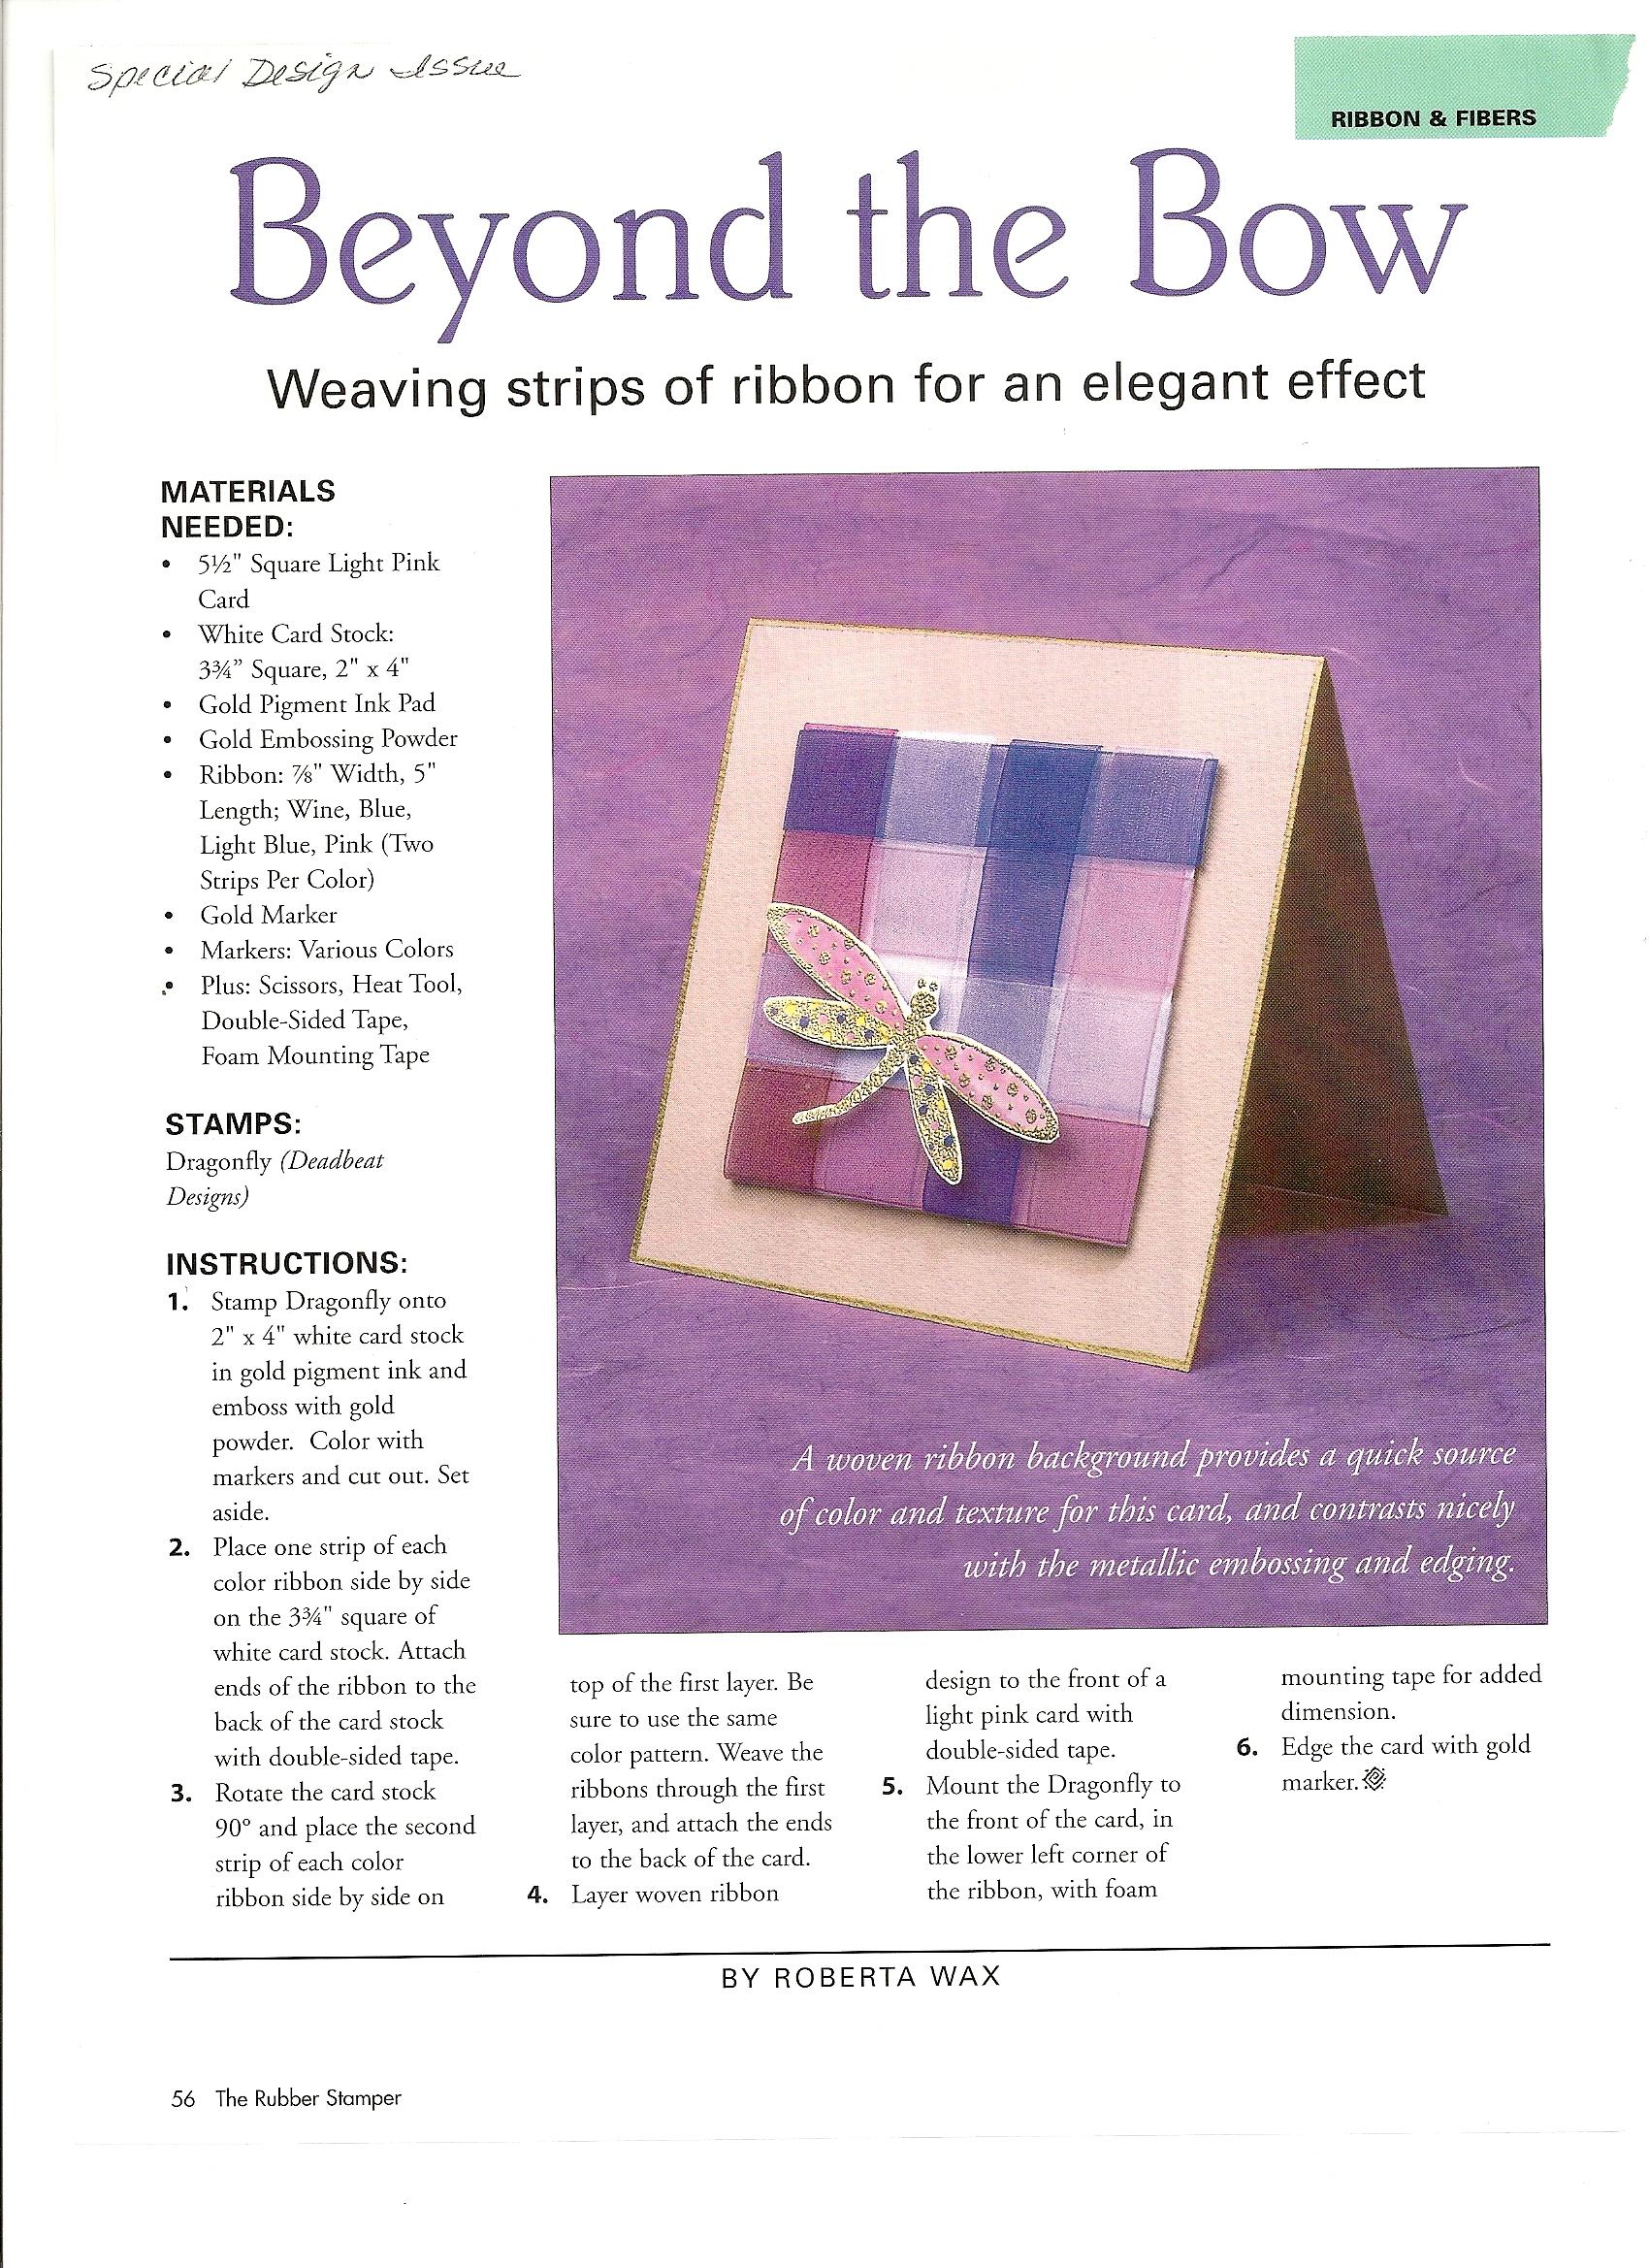 Rubber Stamper Design Issue